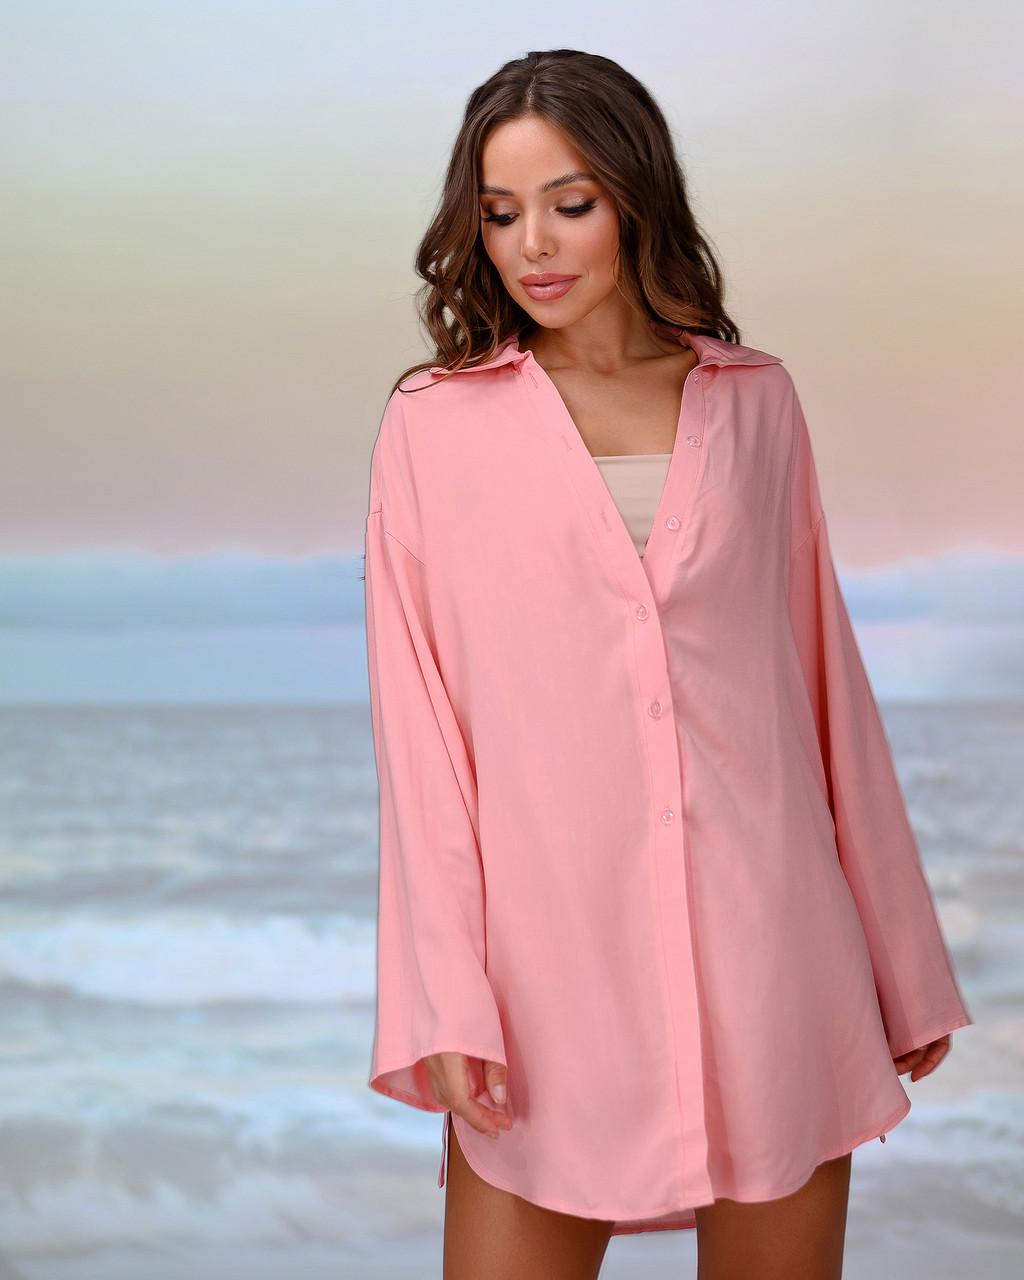 Короткая пляжная туника-рубашка.Цвет персик. Размер 46-48